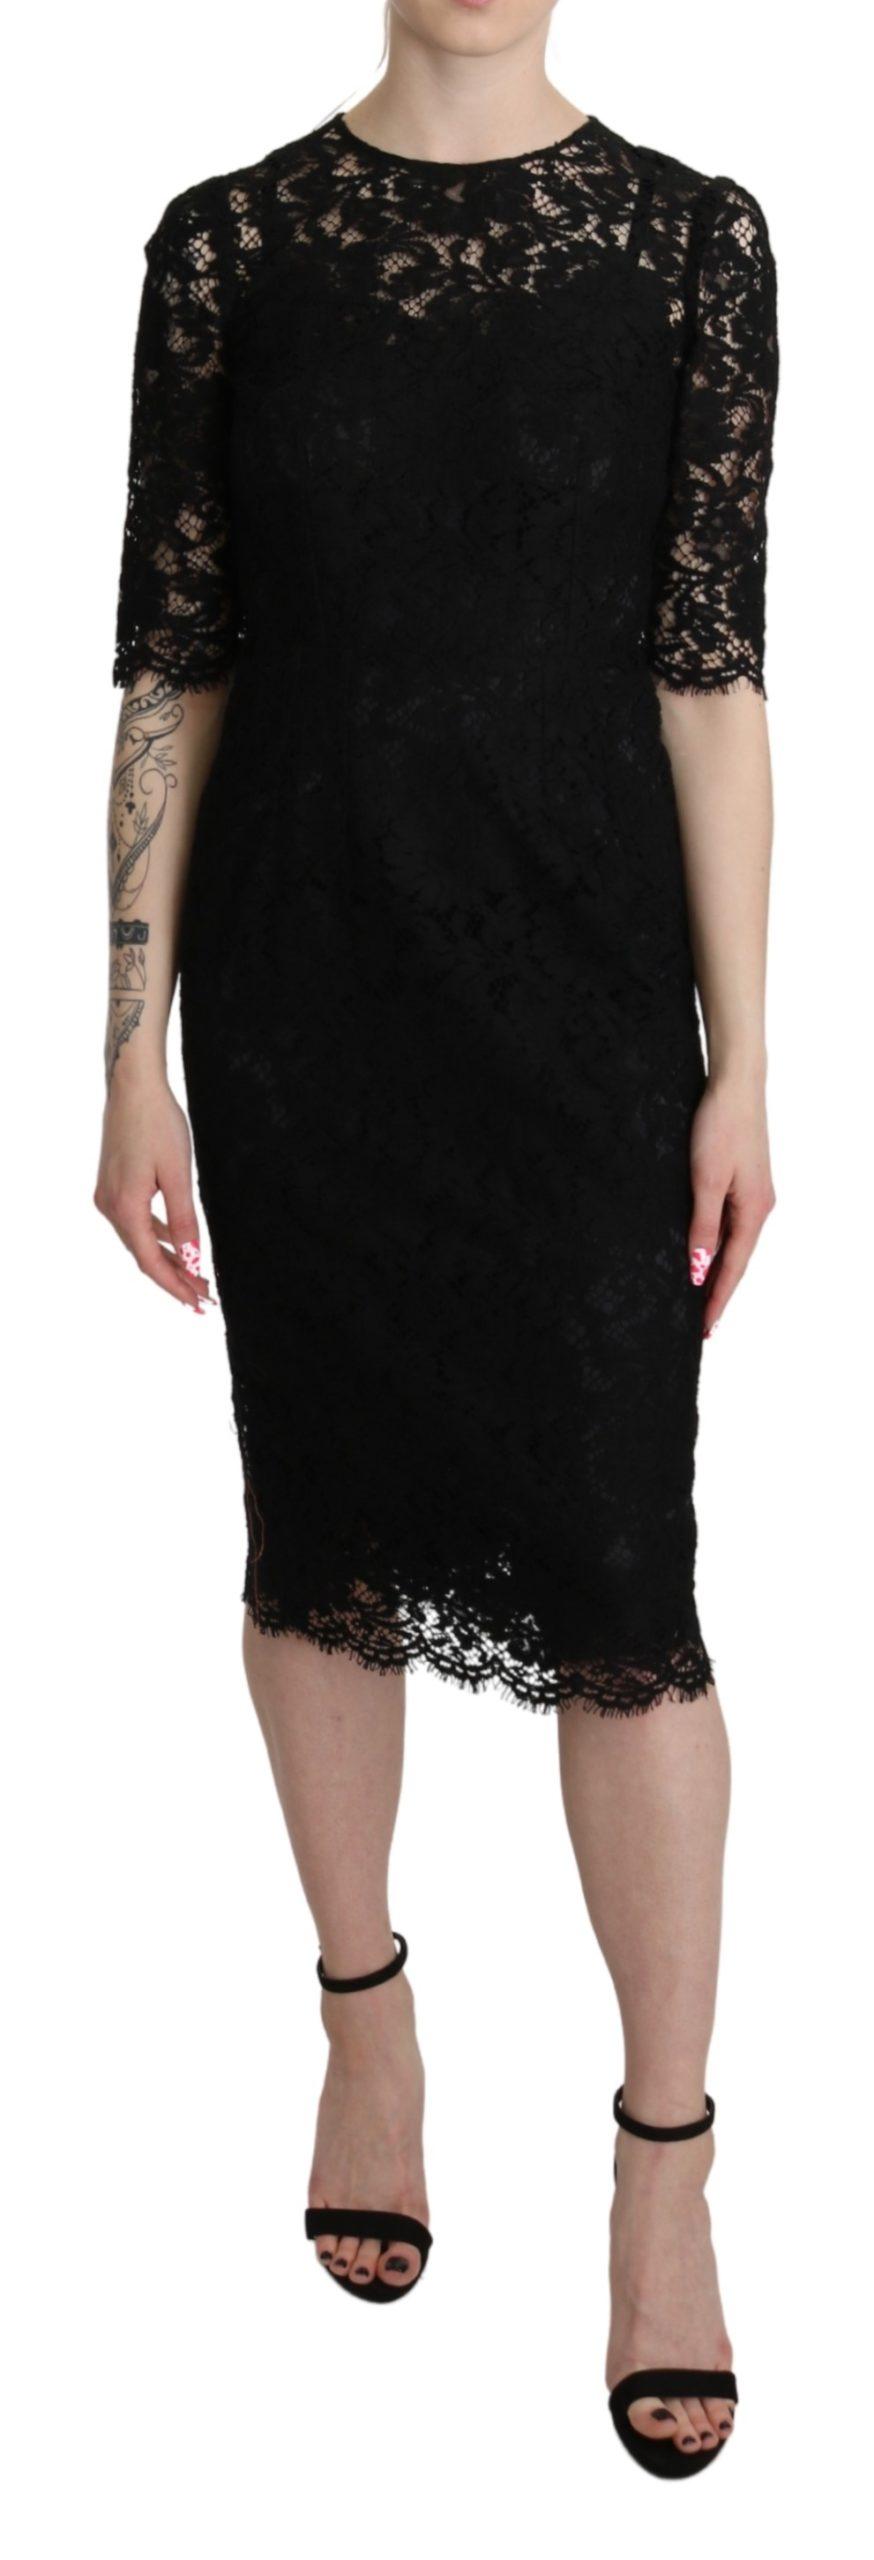 Dolce & Gabbana Women's Floral Lace Sheath Dress Black DR2616 - IT38|XS